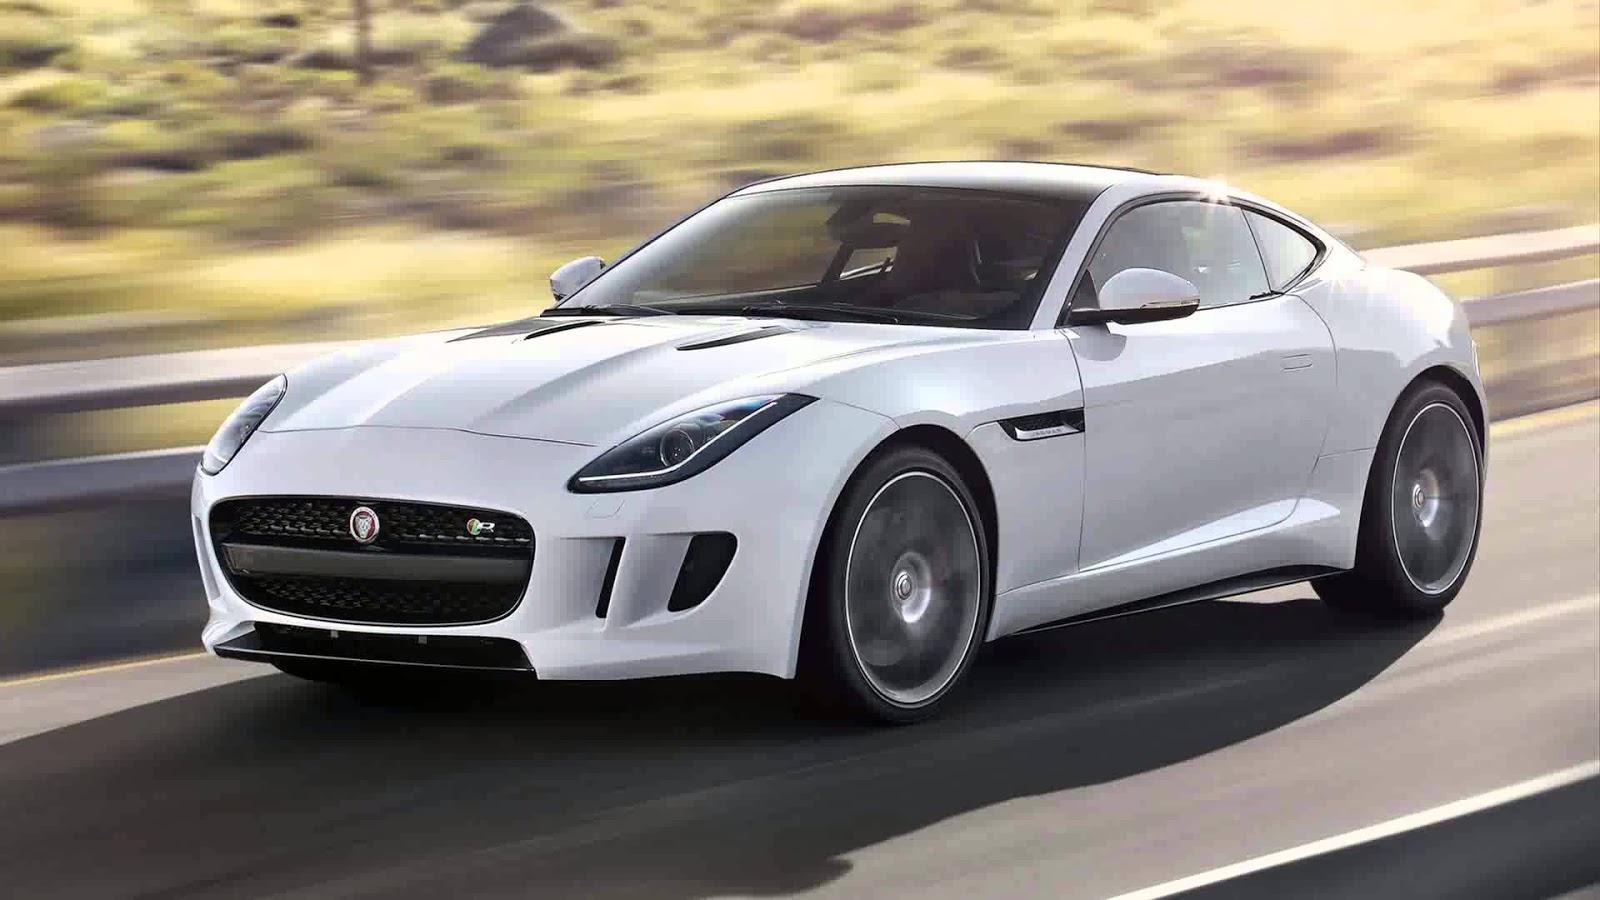 White Jaguar Hd Pic